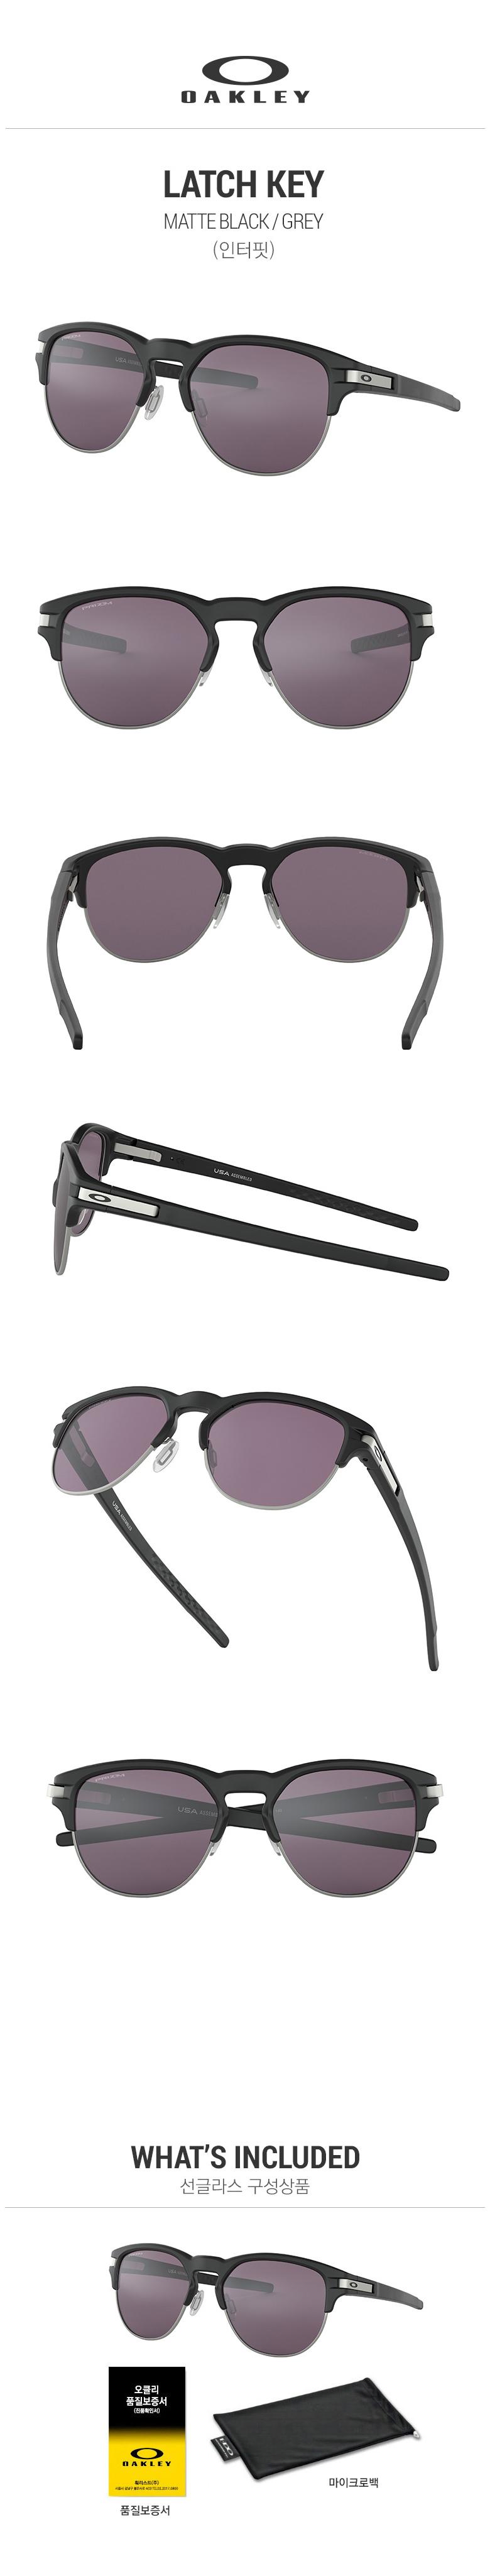 Latch Key Matte Black W Oakley Sunglass Frogskins Prizm Oo 9245 74 Grey Smoke